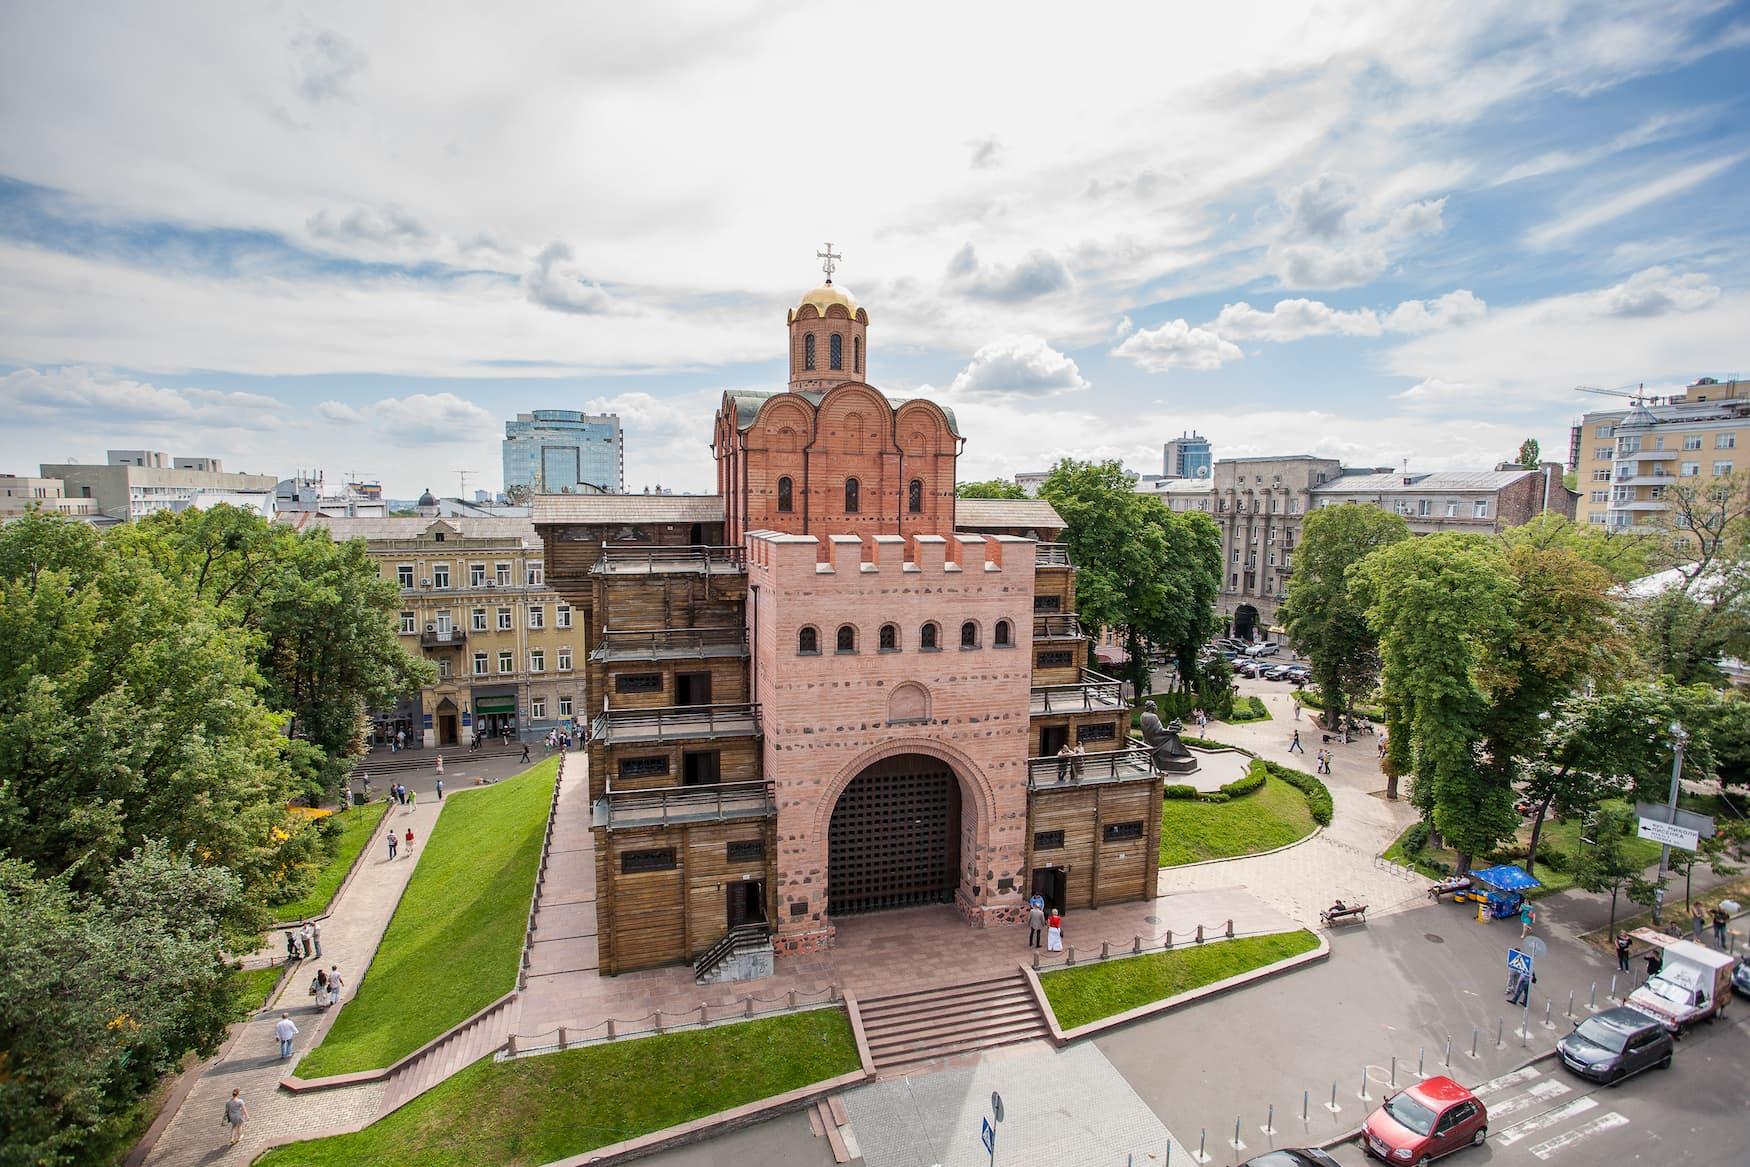 Sehenswürdigkeit in Kiew: Das Goldene Tor